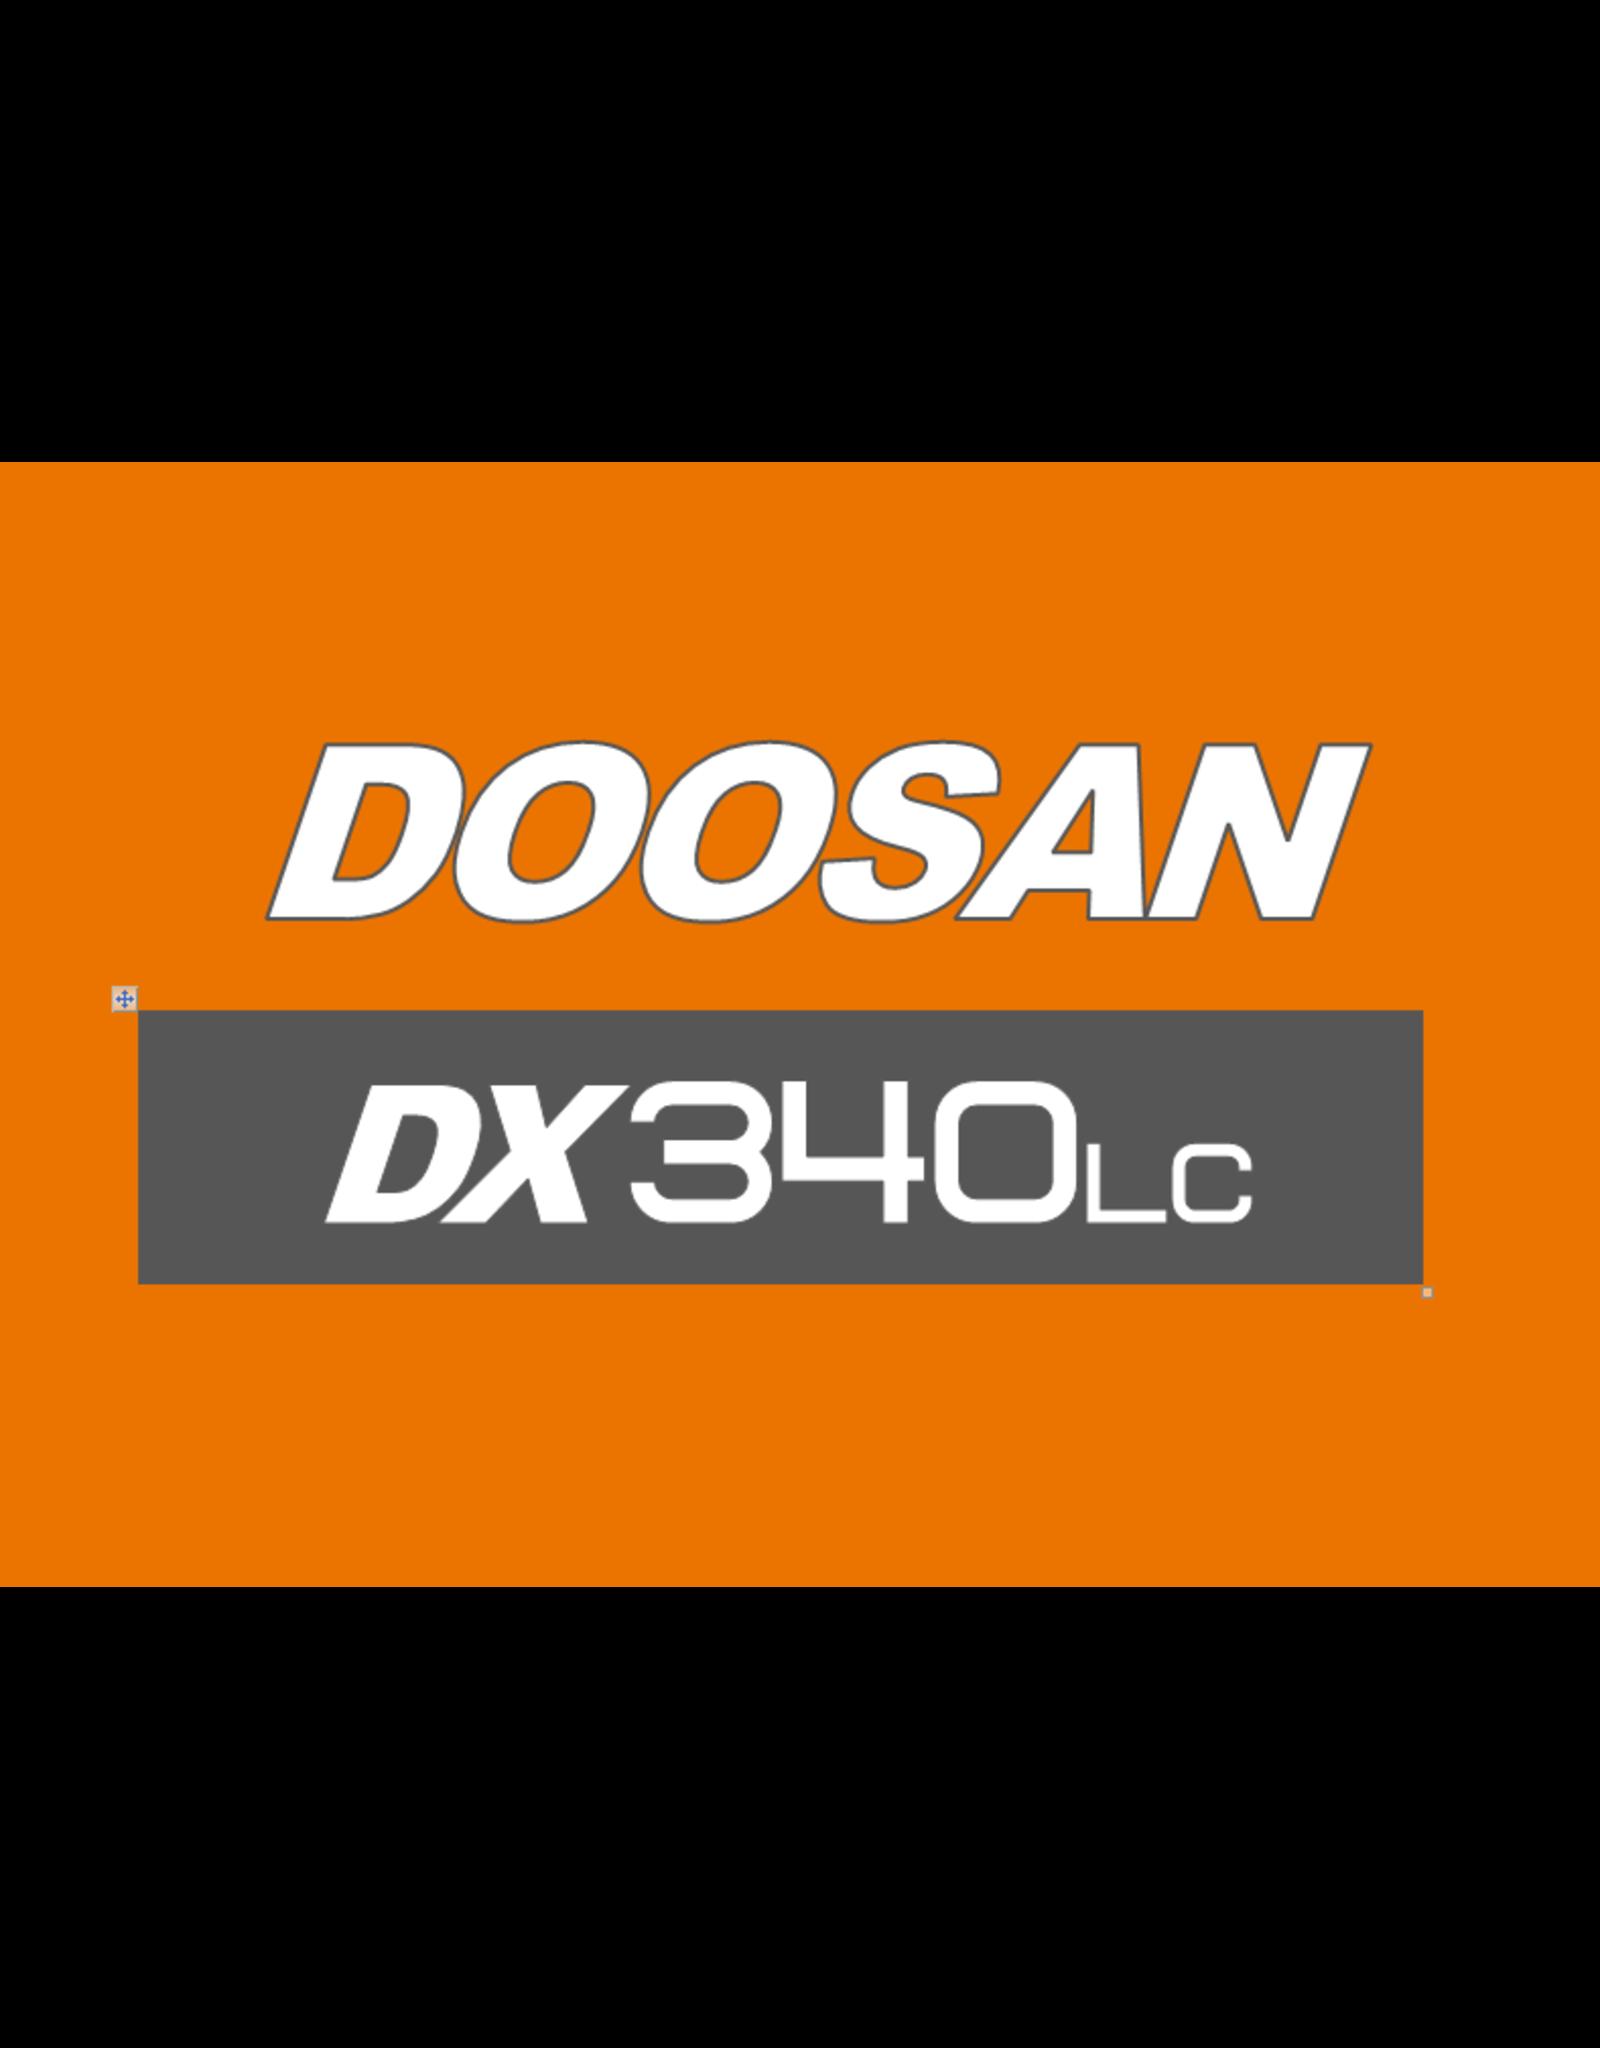 Echle Hartstahl GmbH FOPS für Doosan DX340LC-5